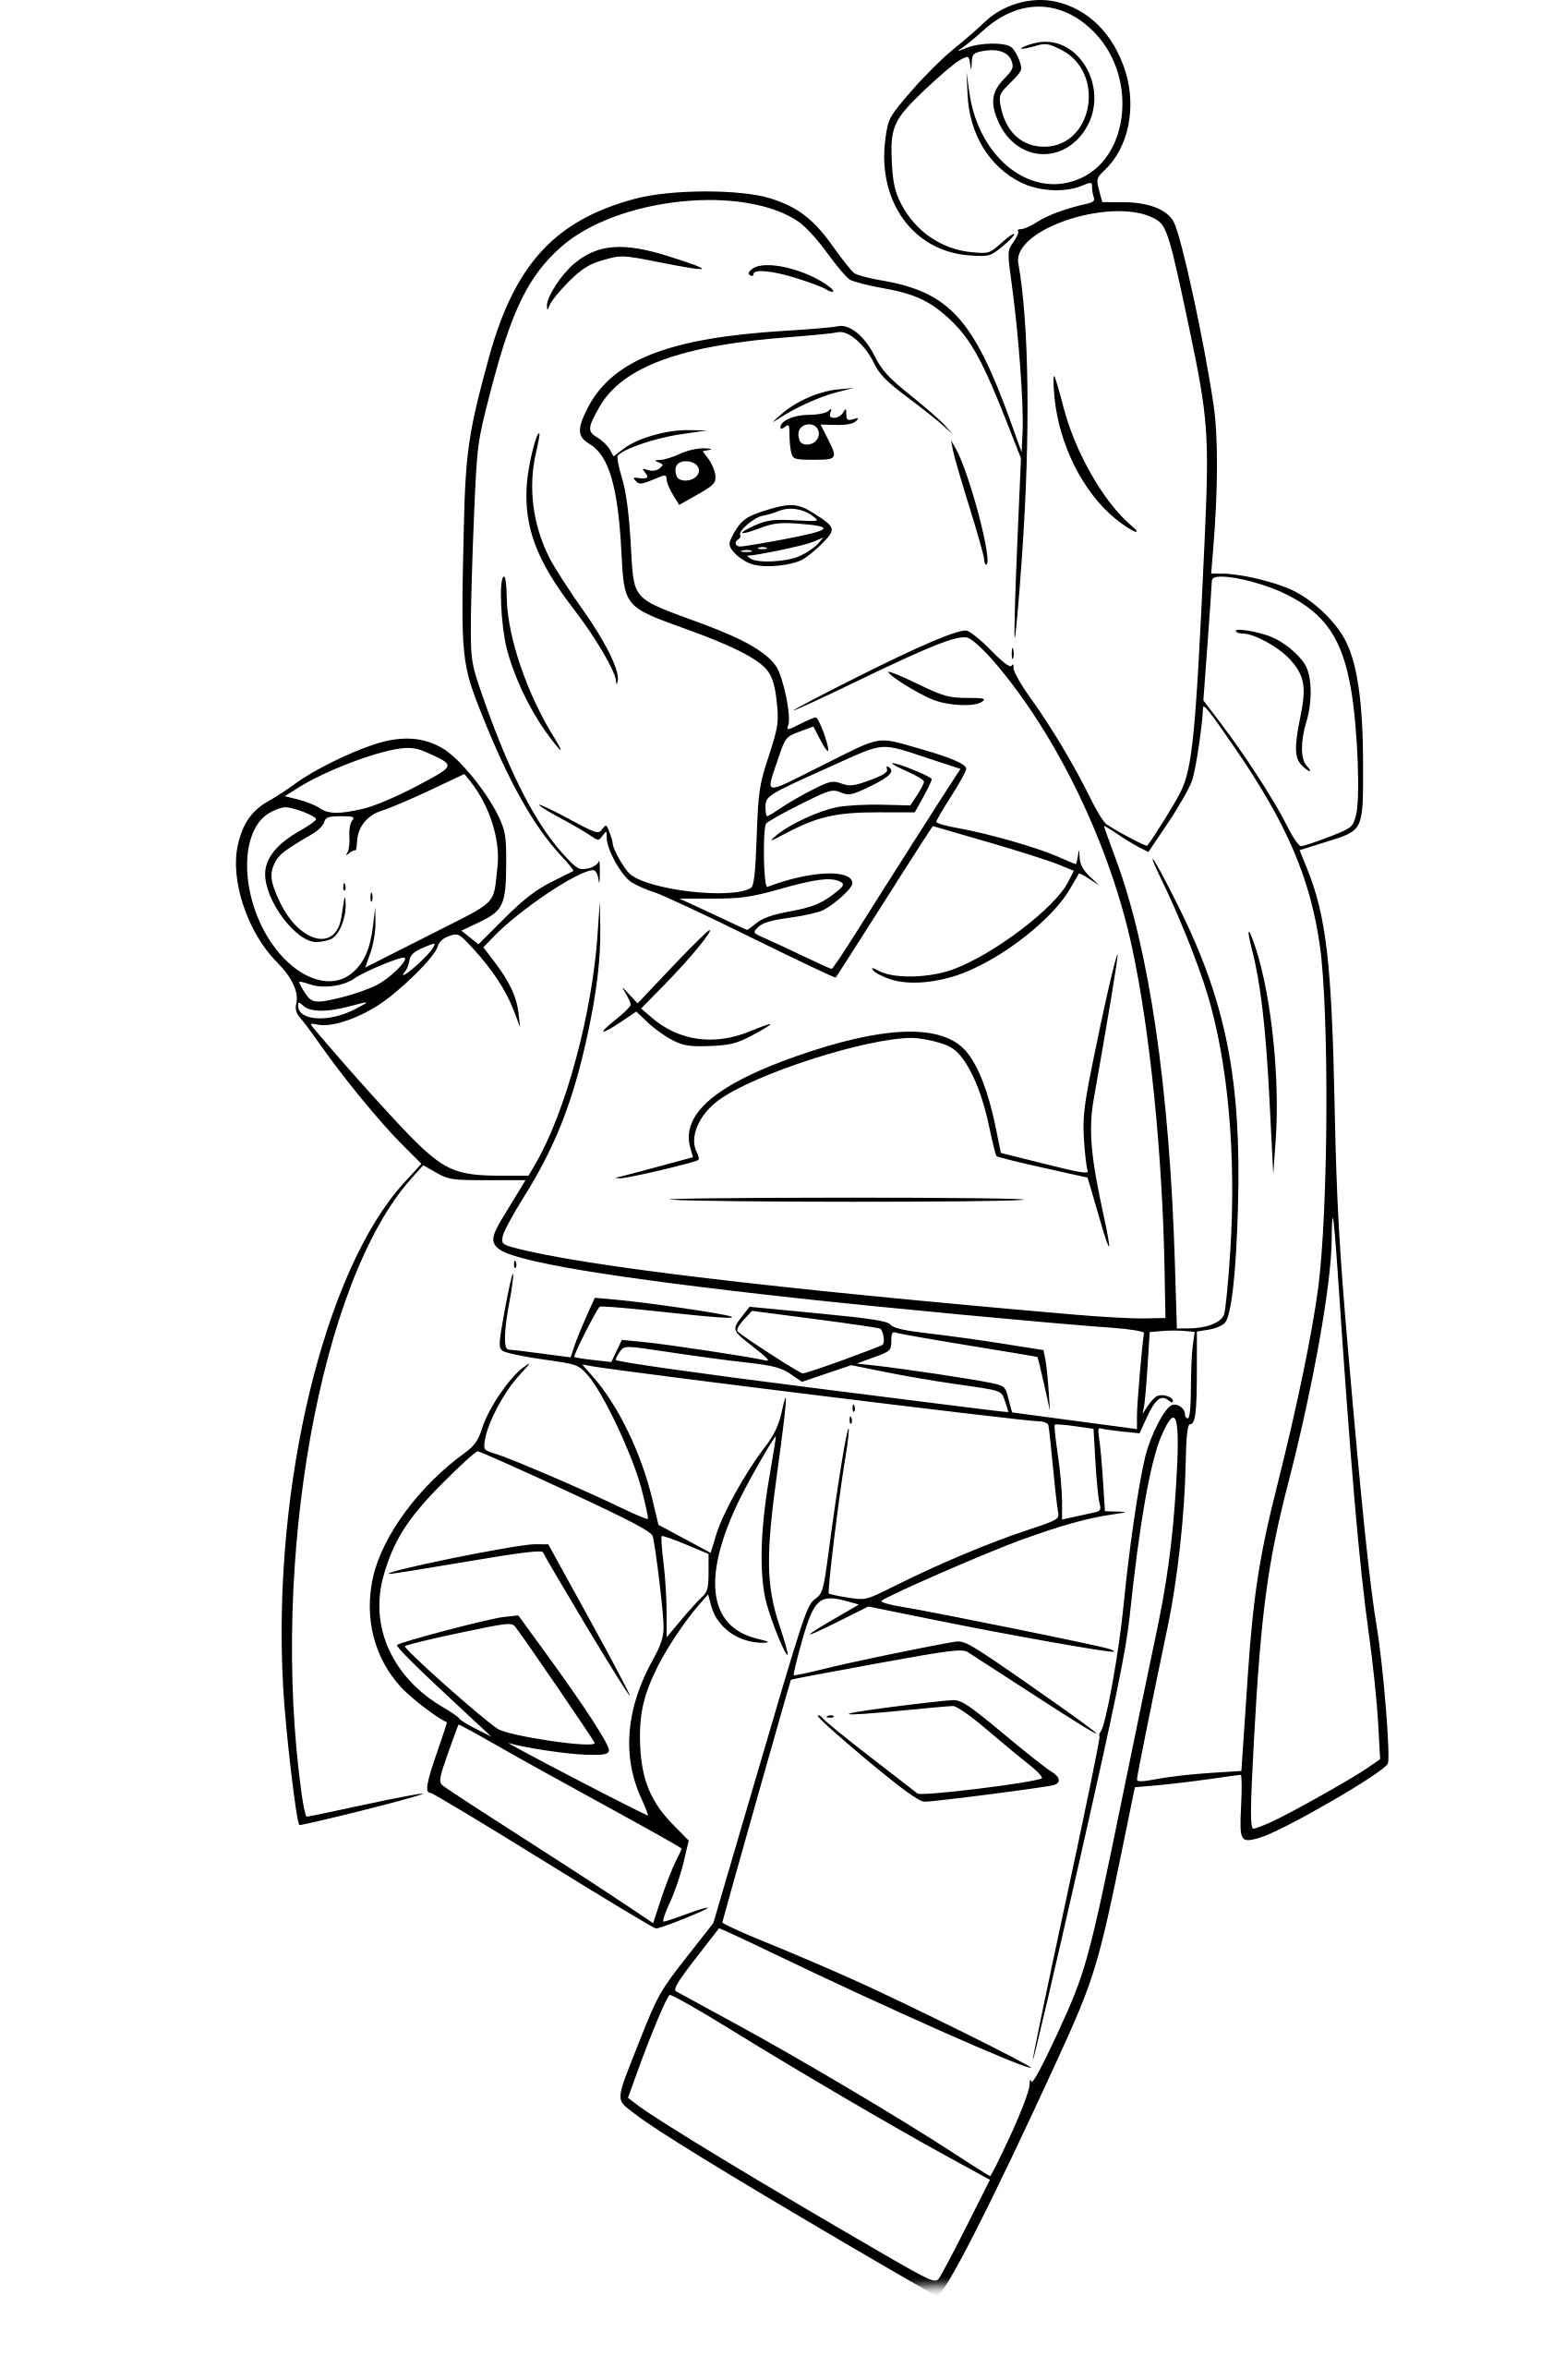 Coloriage lego supergirl imprimer - Lego coloriage ...